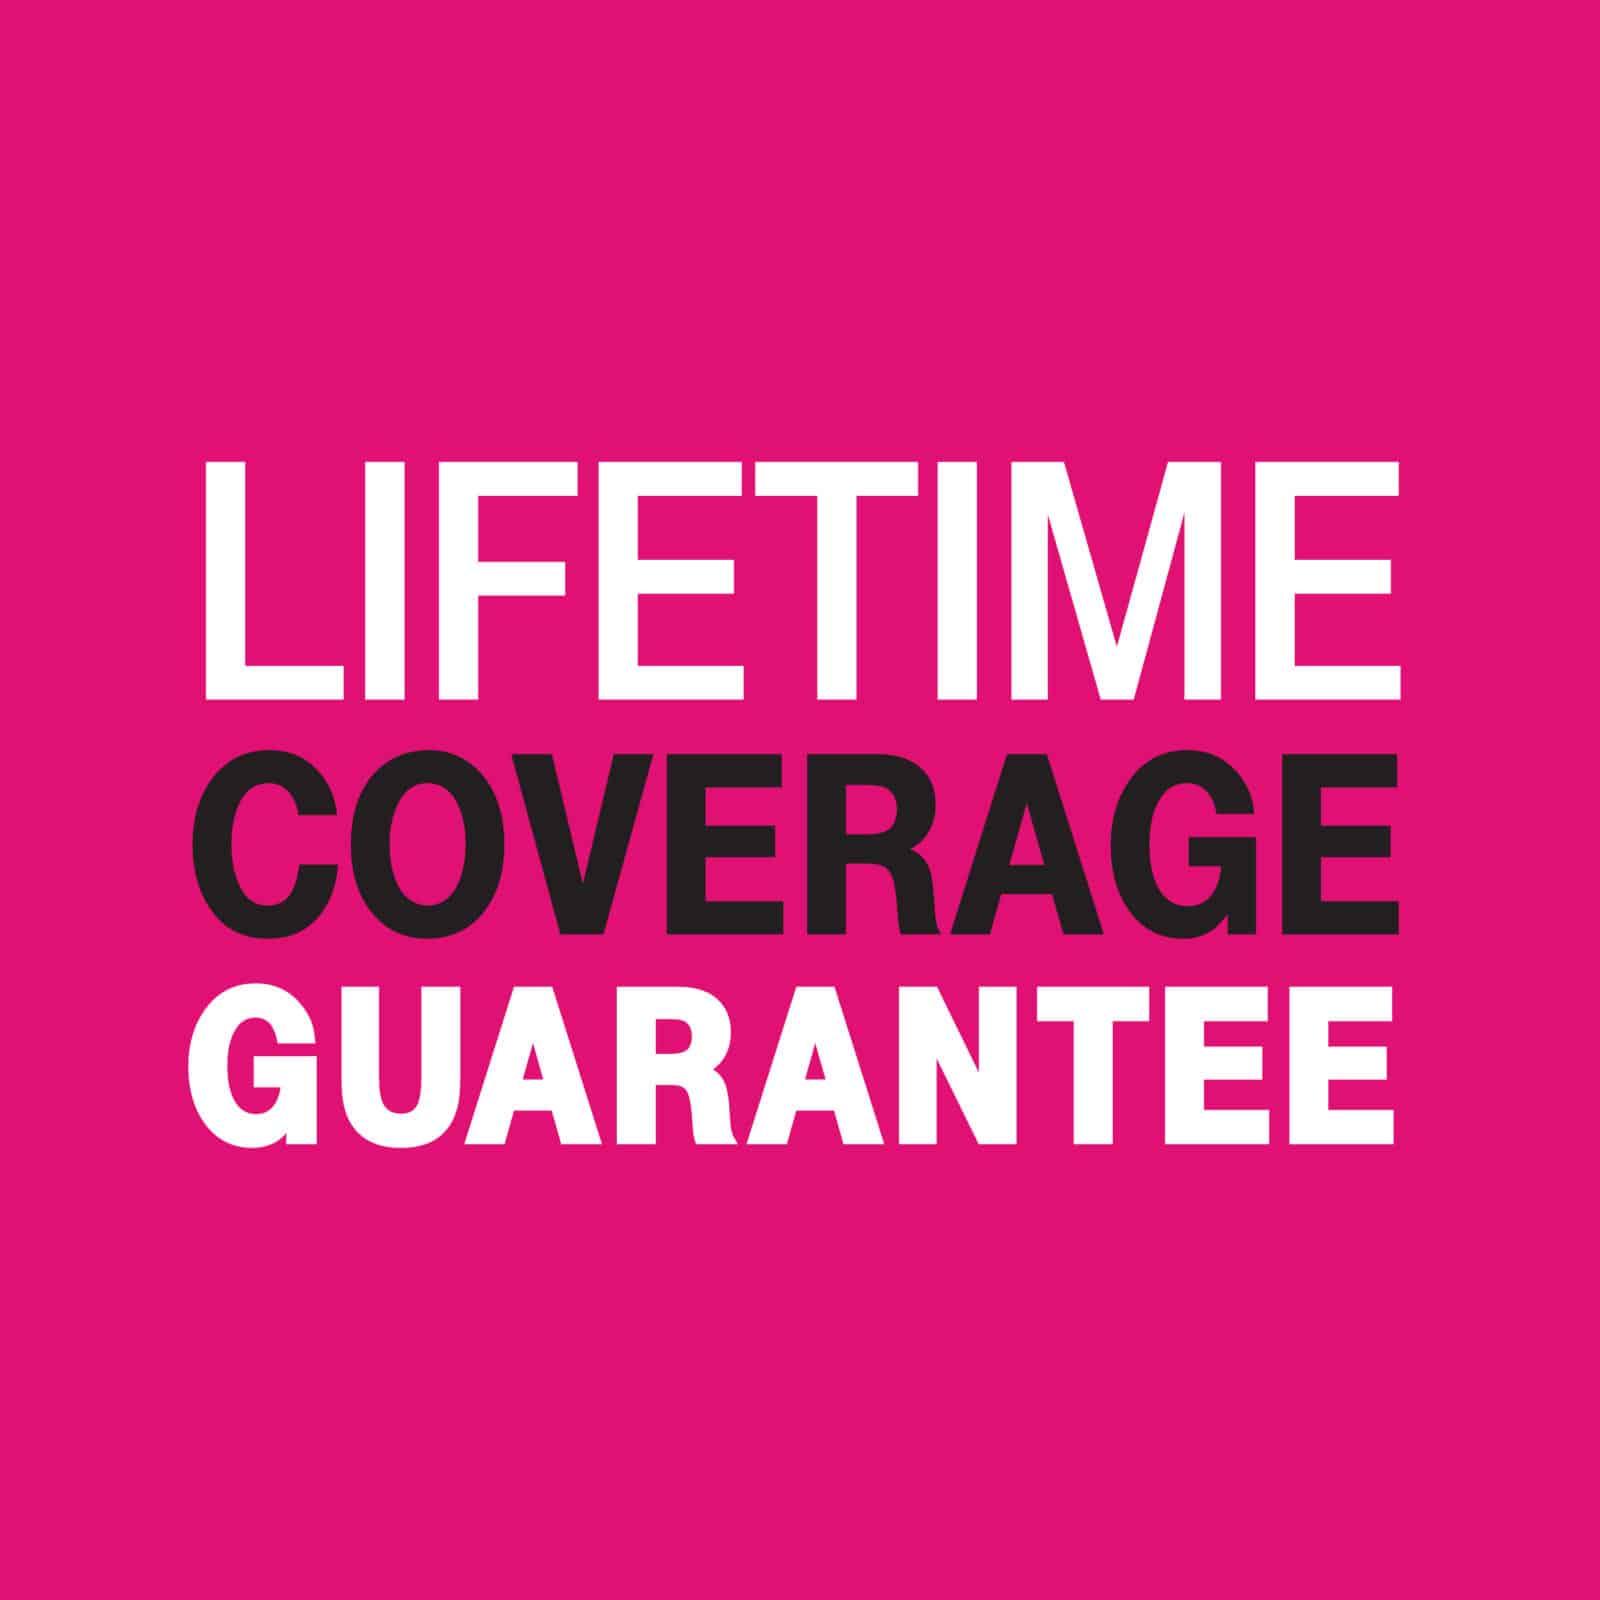 T-Mobile Lifetime Coverage Guarantee